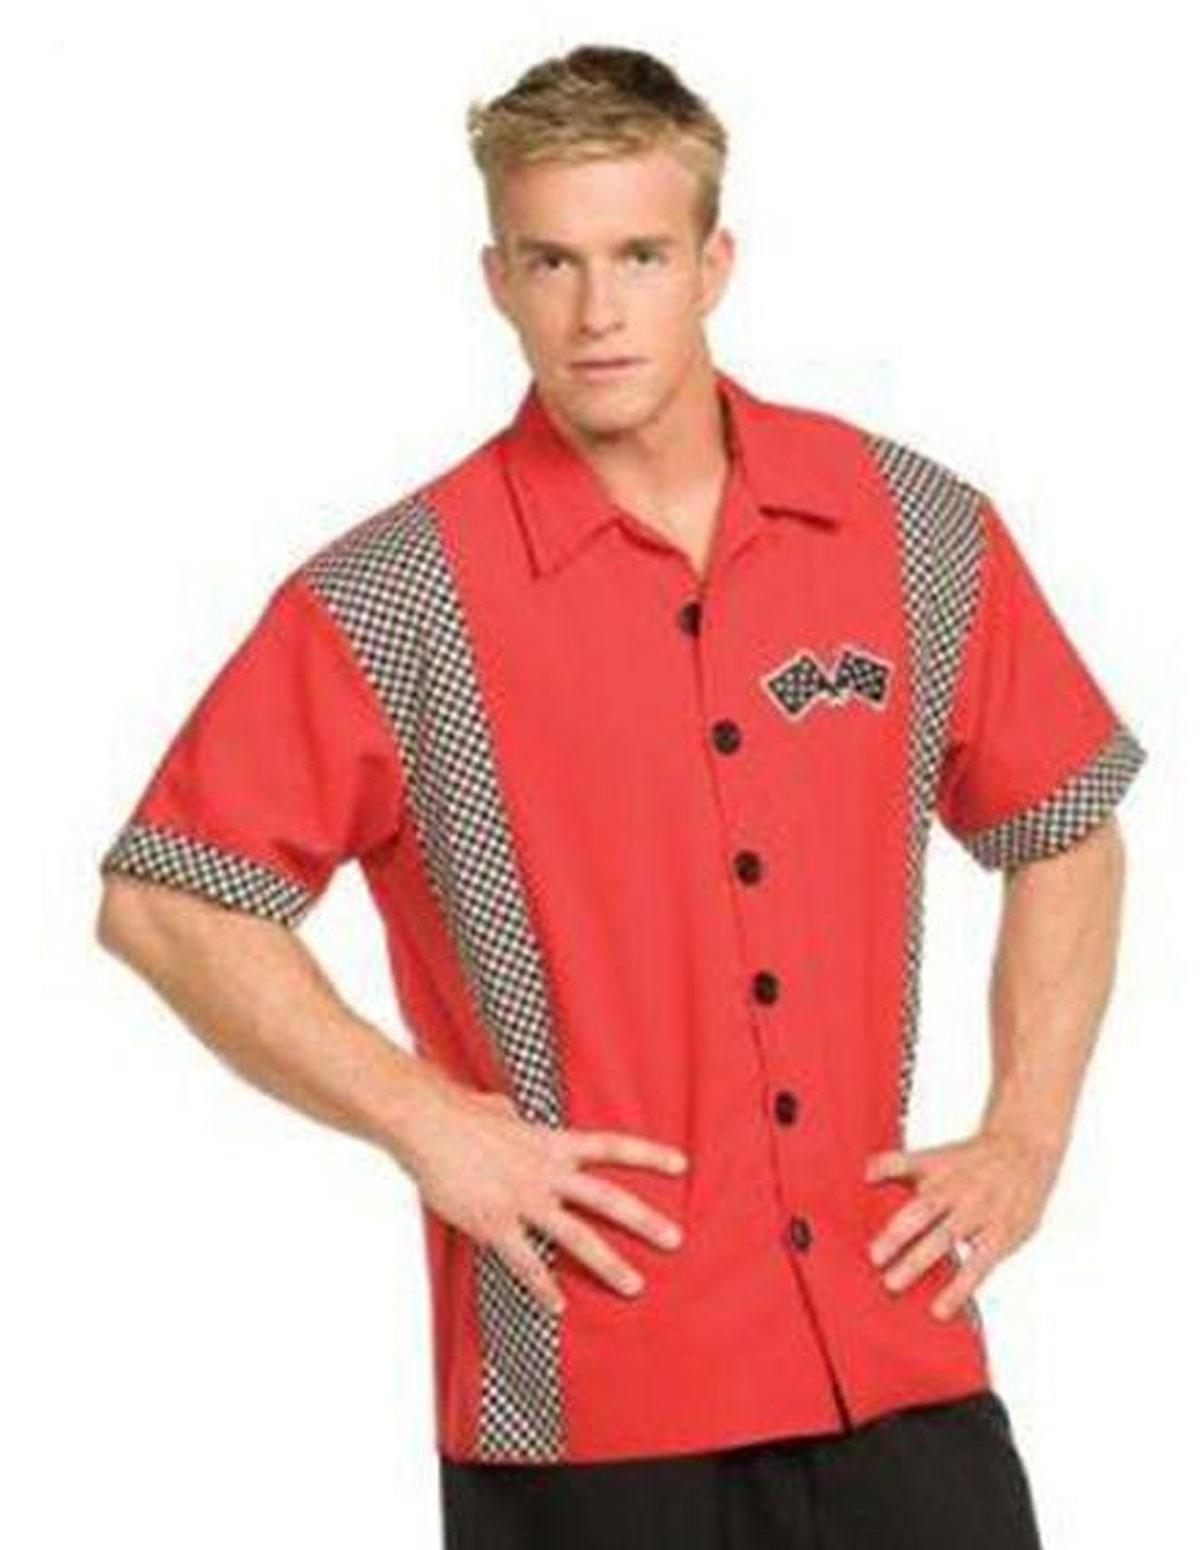 Pit Crew Shirt Costume